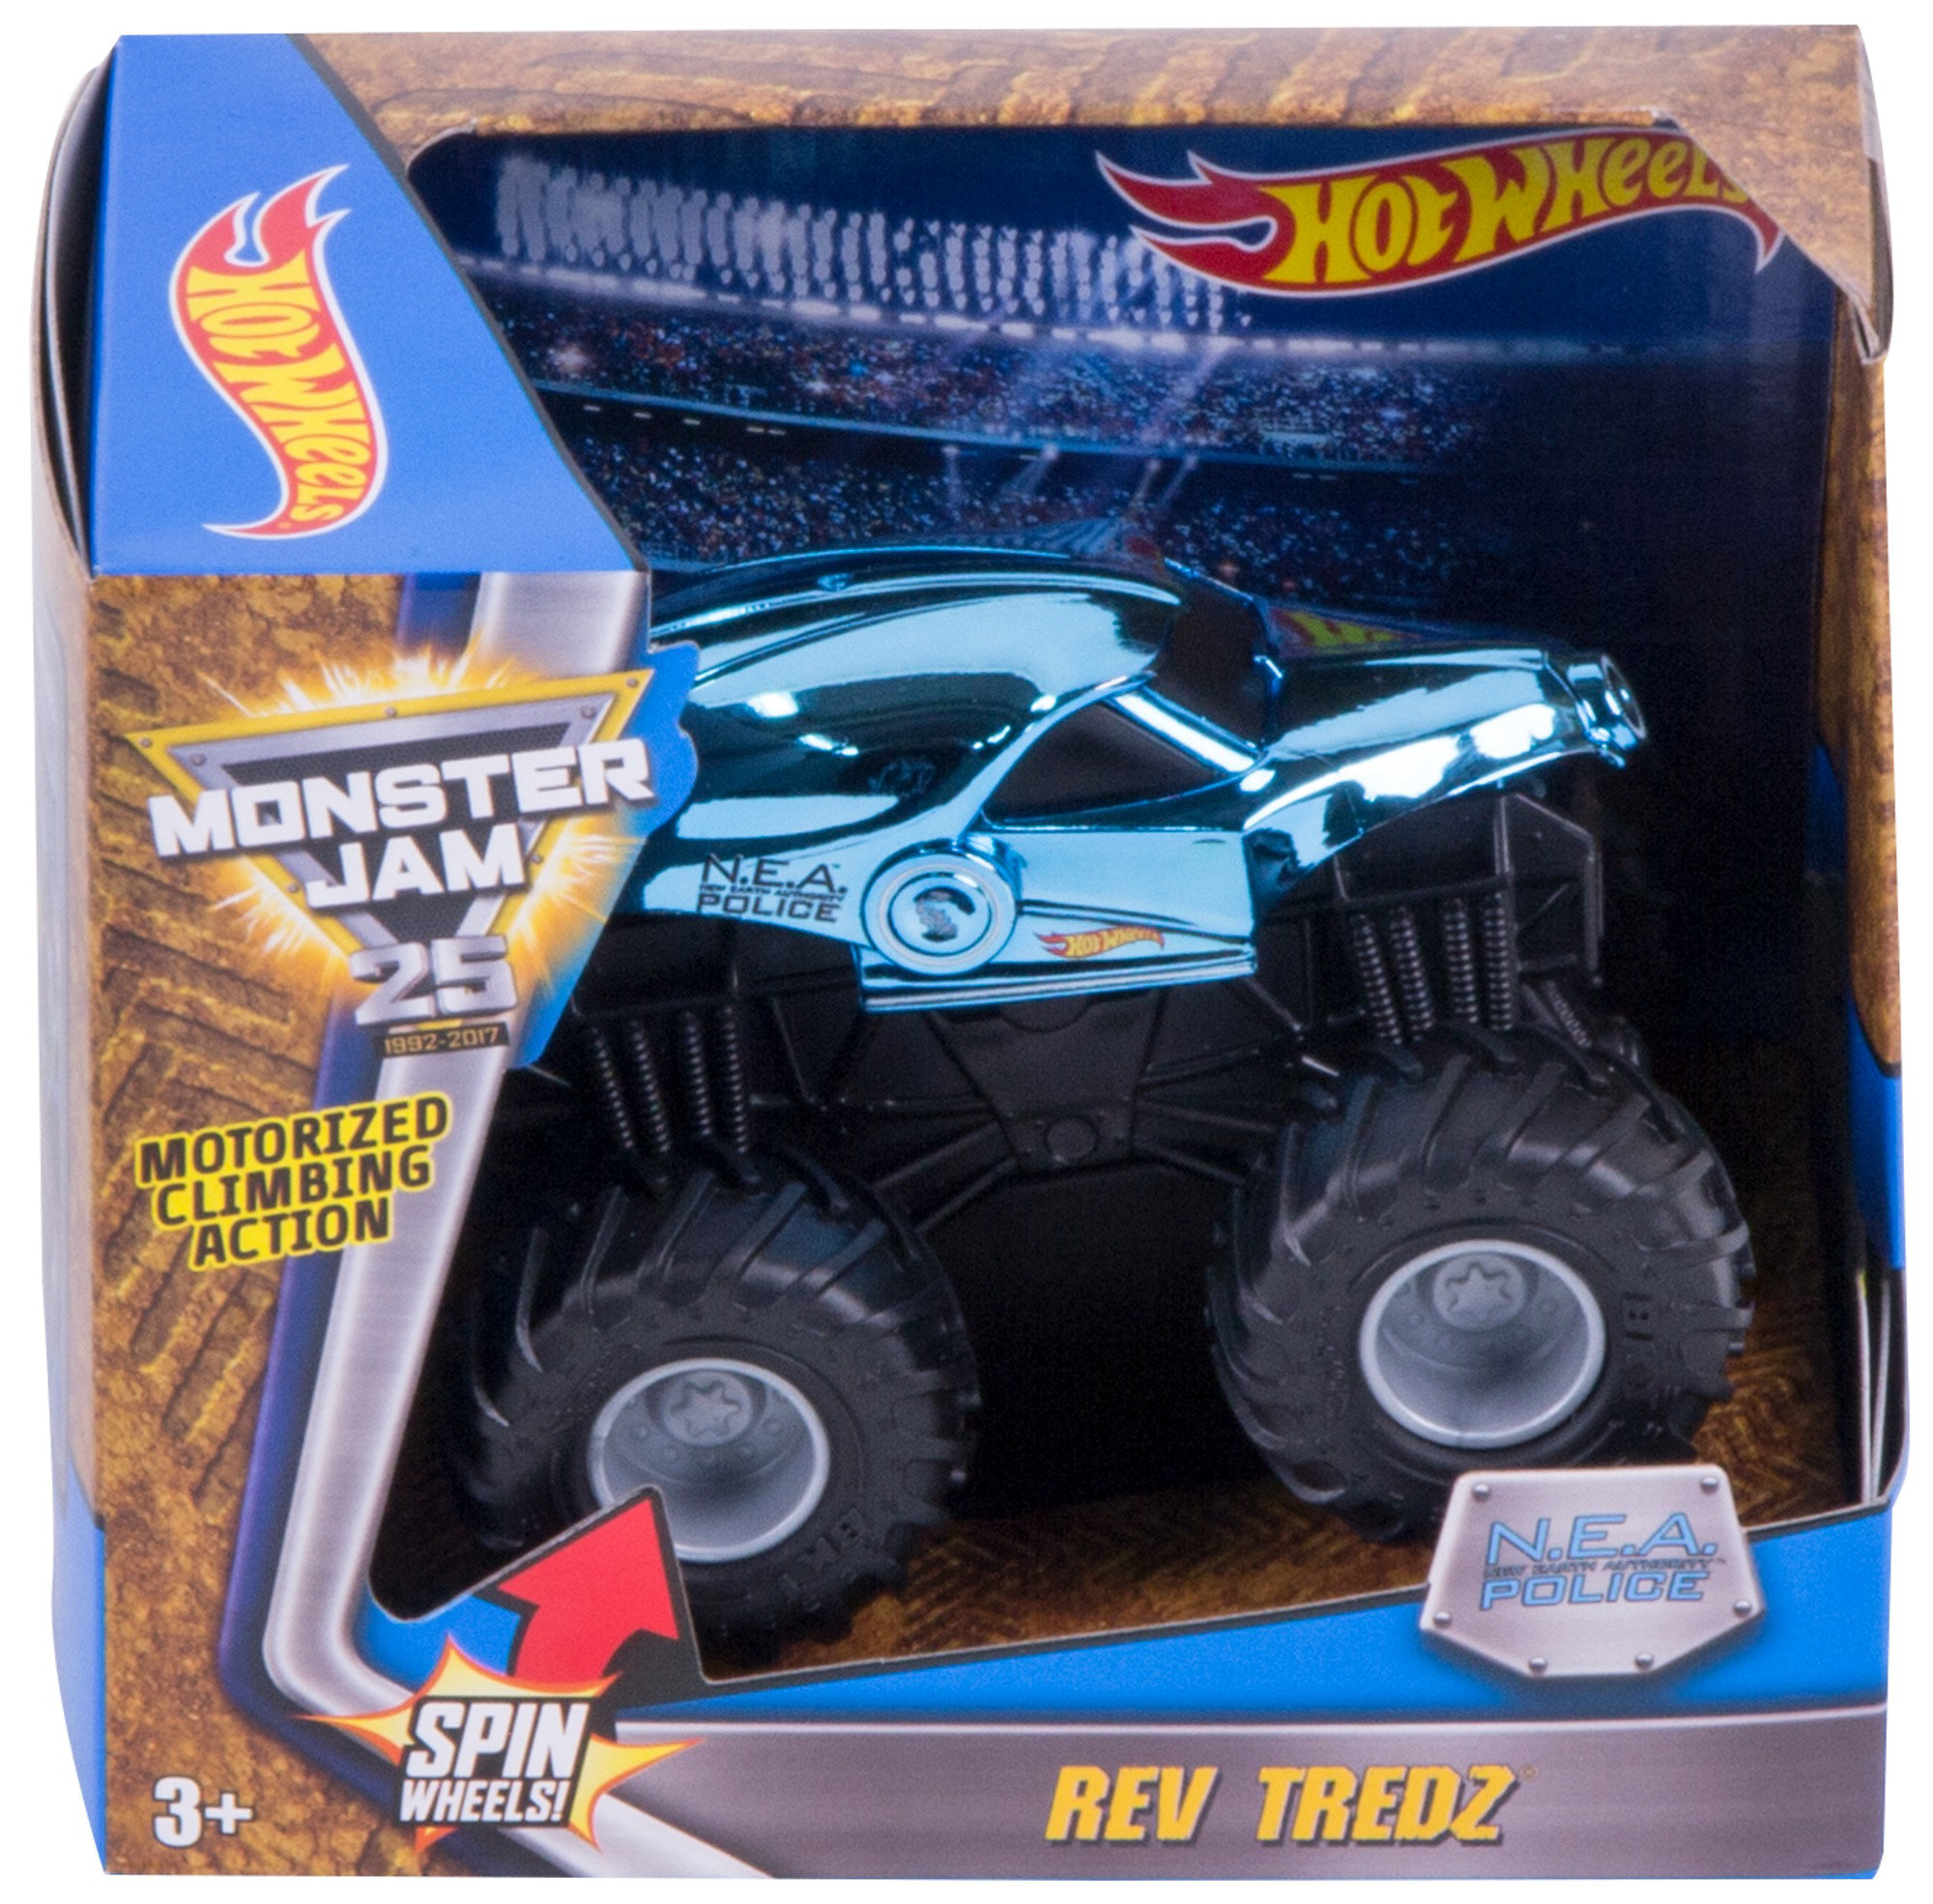 Hot Wheels Monster Jam Rev Tredz New Earth Authority Vehicle by Mattel